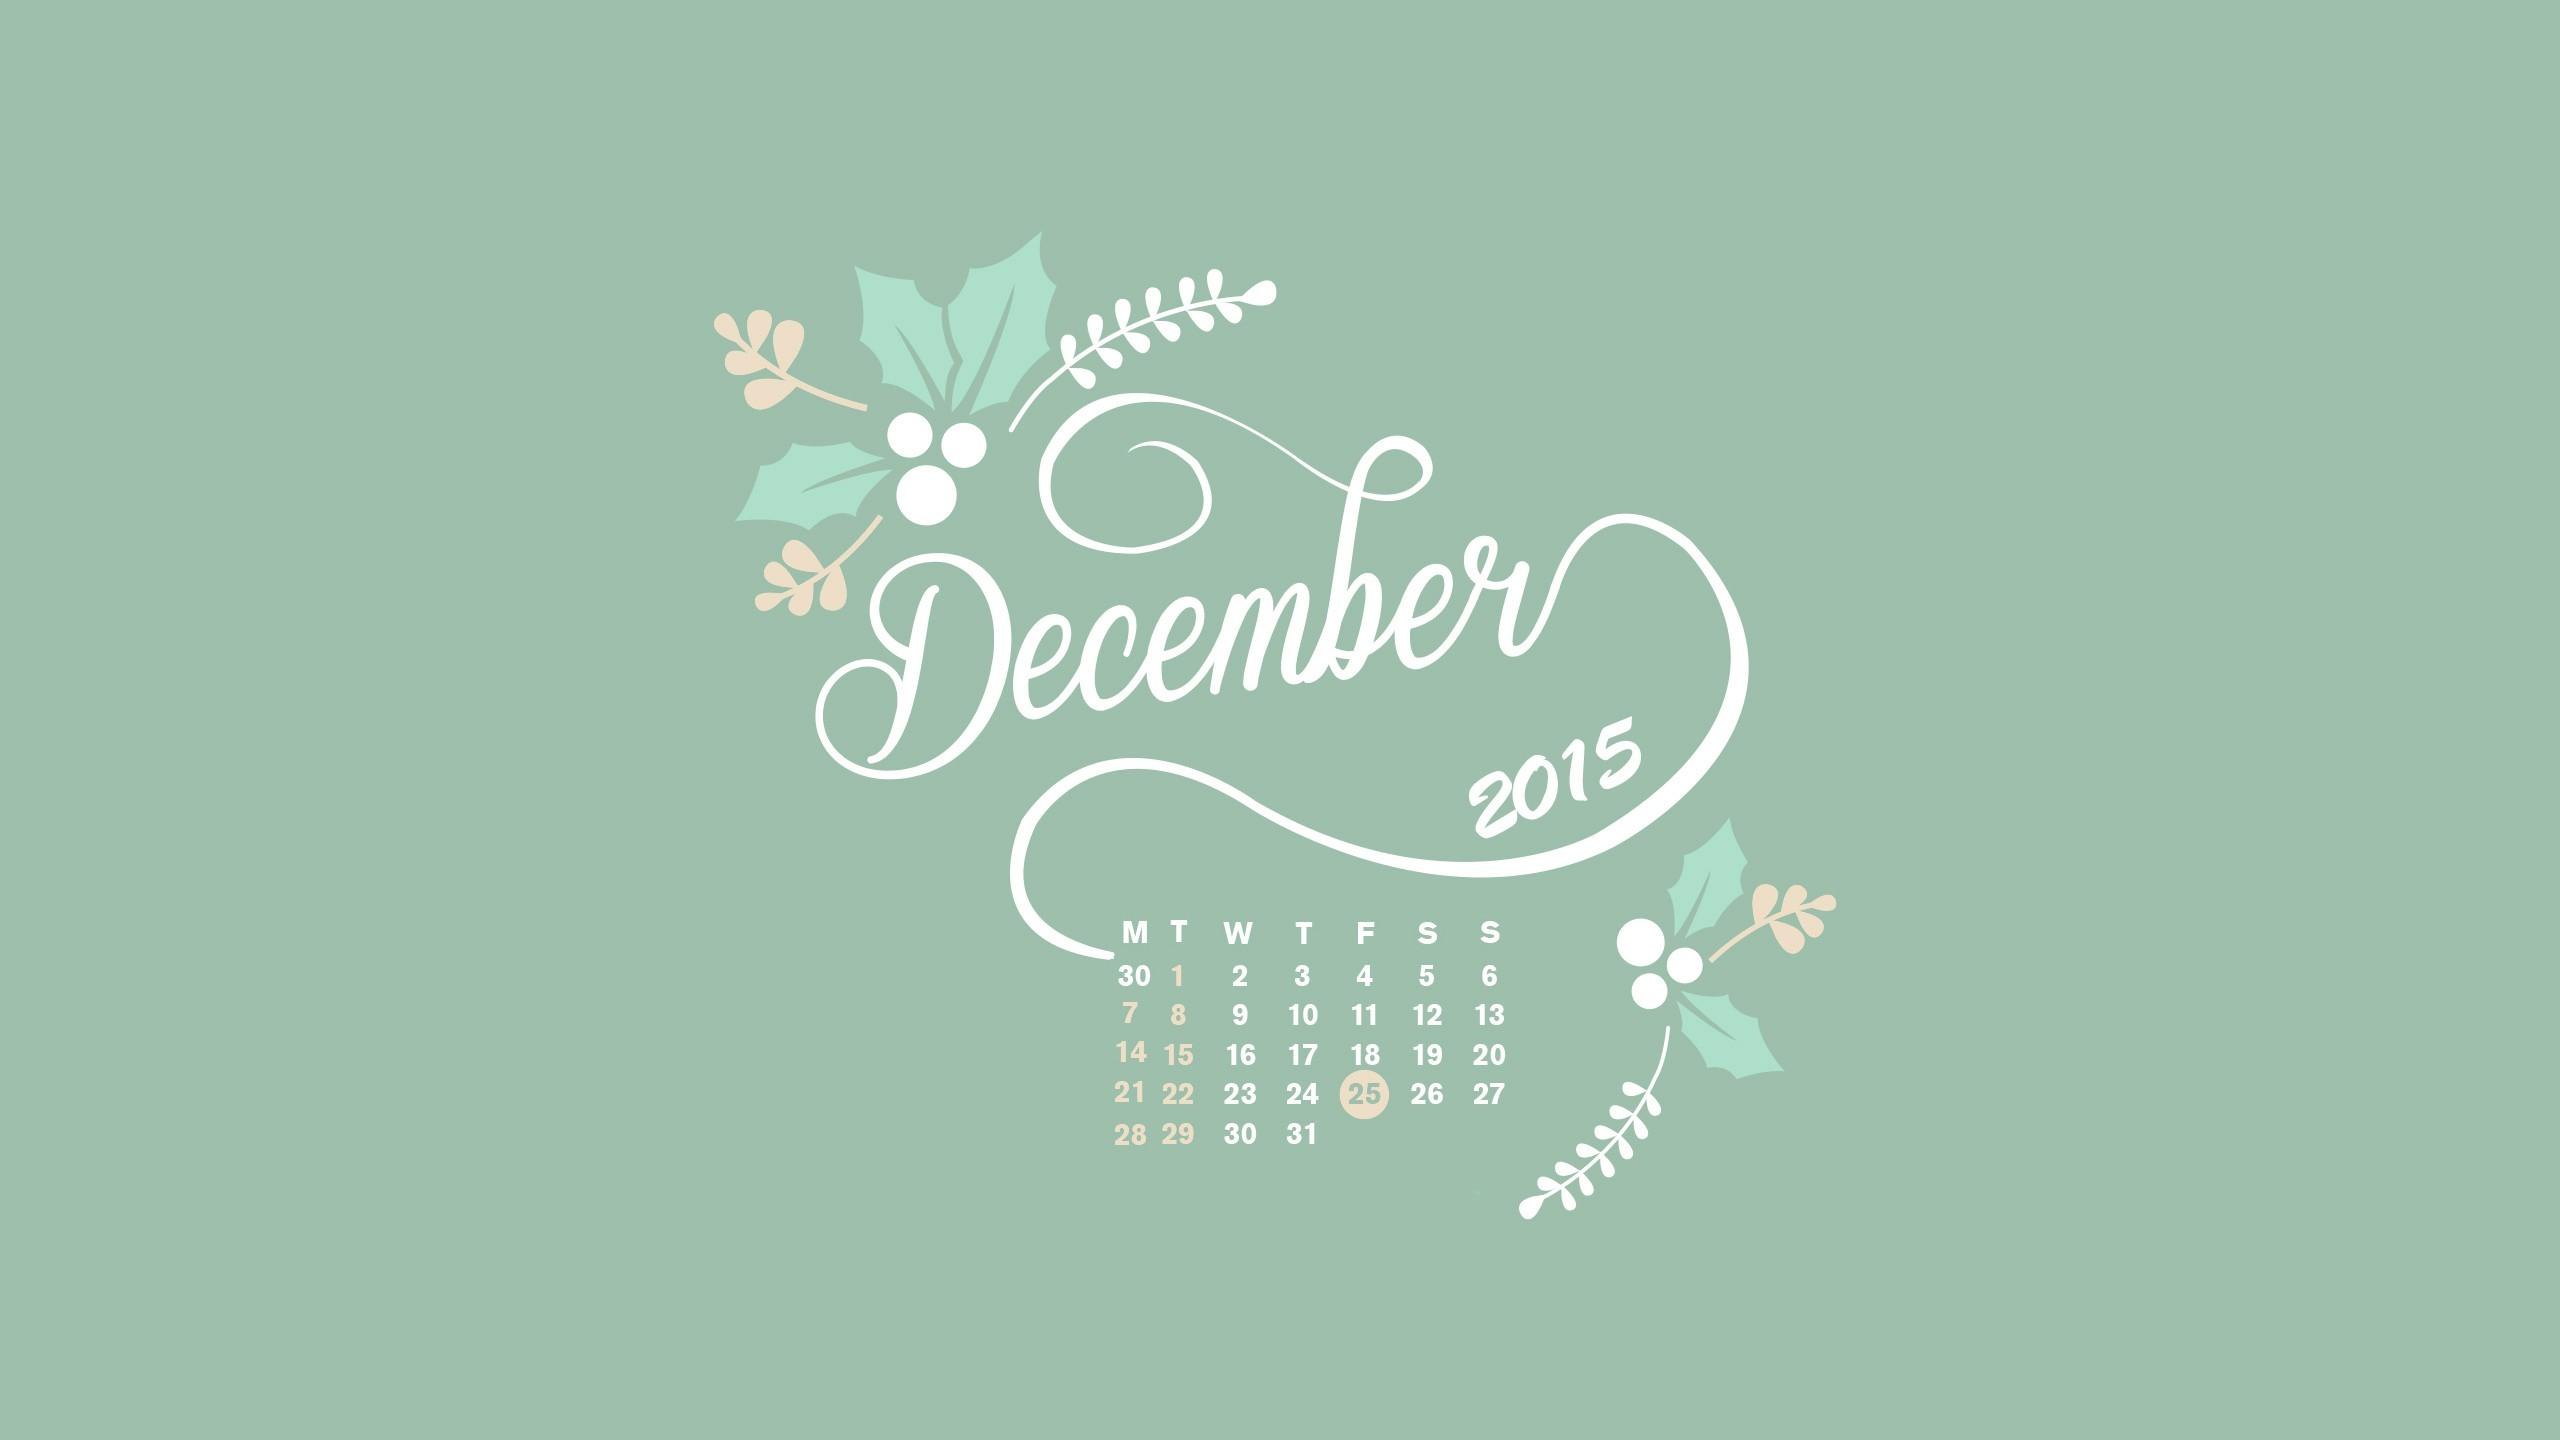 Cute Pink Owl Wallpaper For Iphone Desktop Wallpapers Calendar December 2018 183 ①